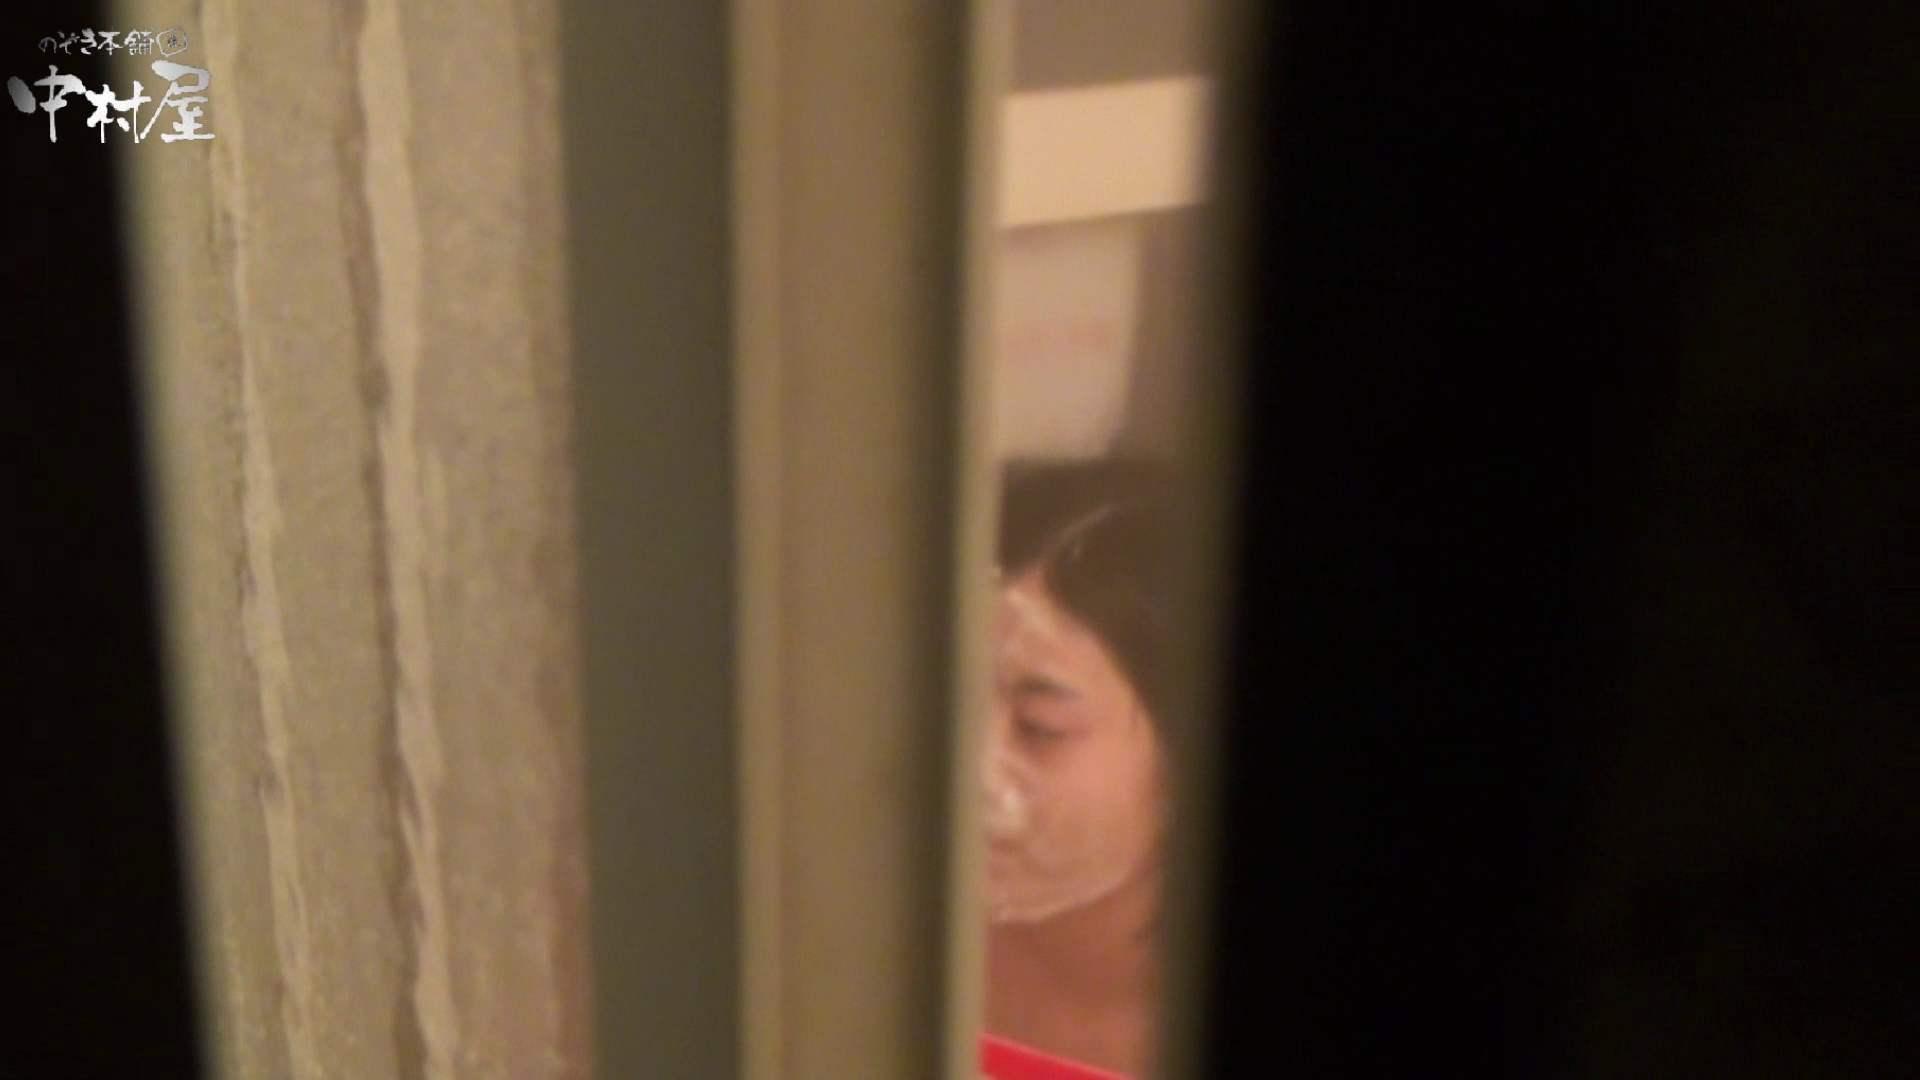 民家風呂専門盗撮師の超危険映像 vol.032 盗撮シリーズ オメコ無修正動画無料 102PIX 42